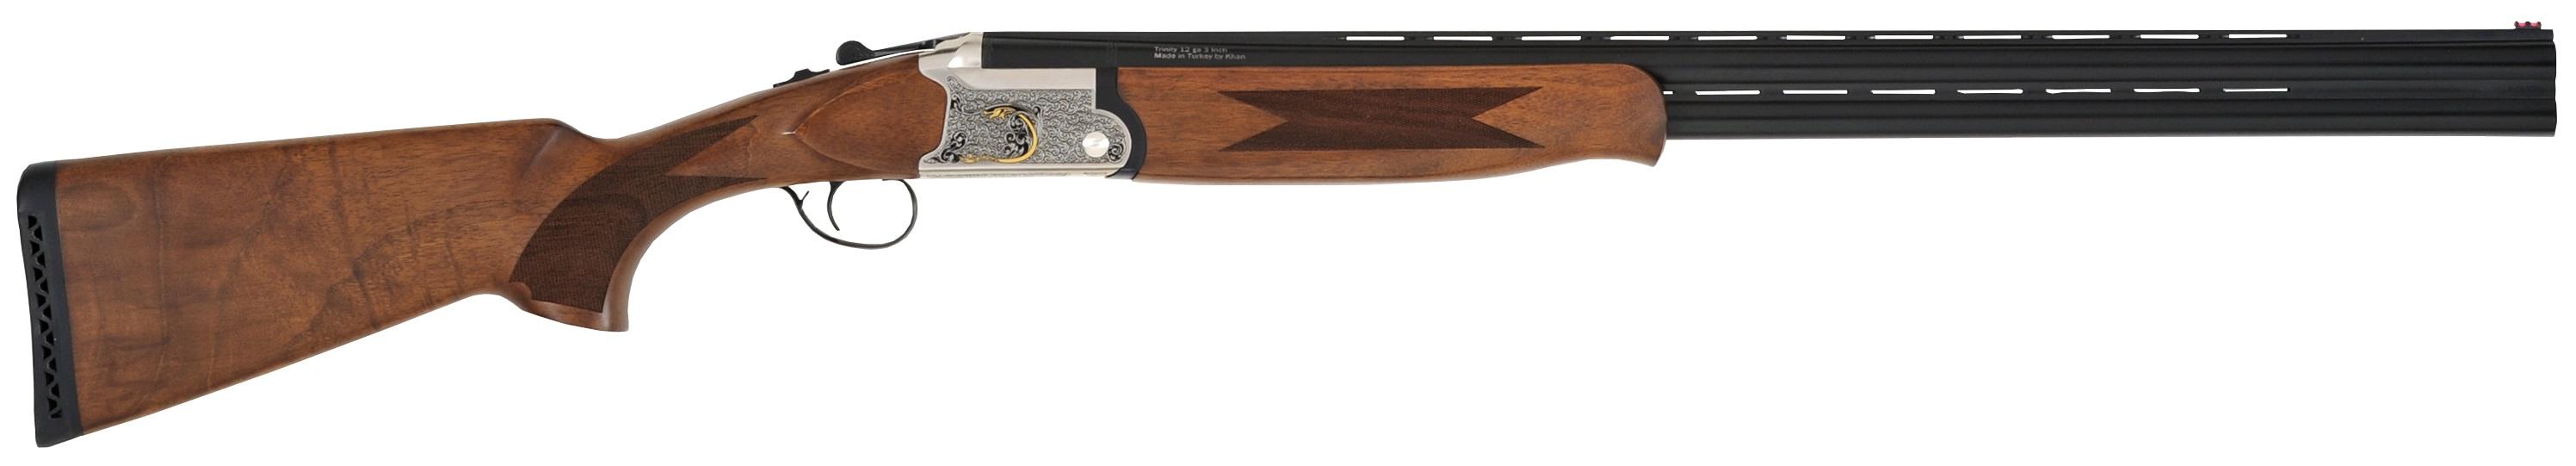 TriStar Sporting Arms TRINITY 20 GAUGE